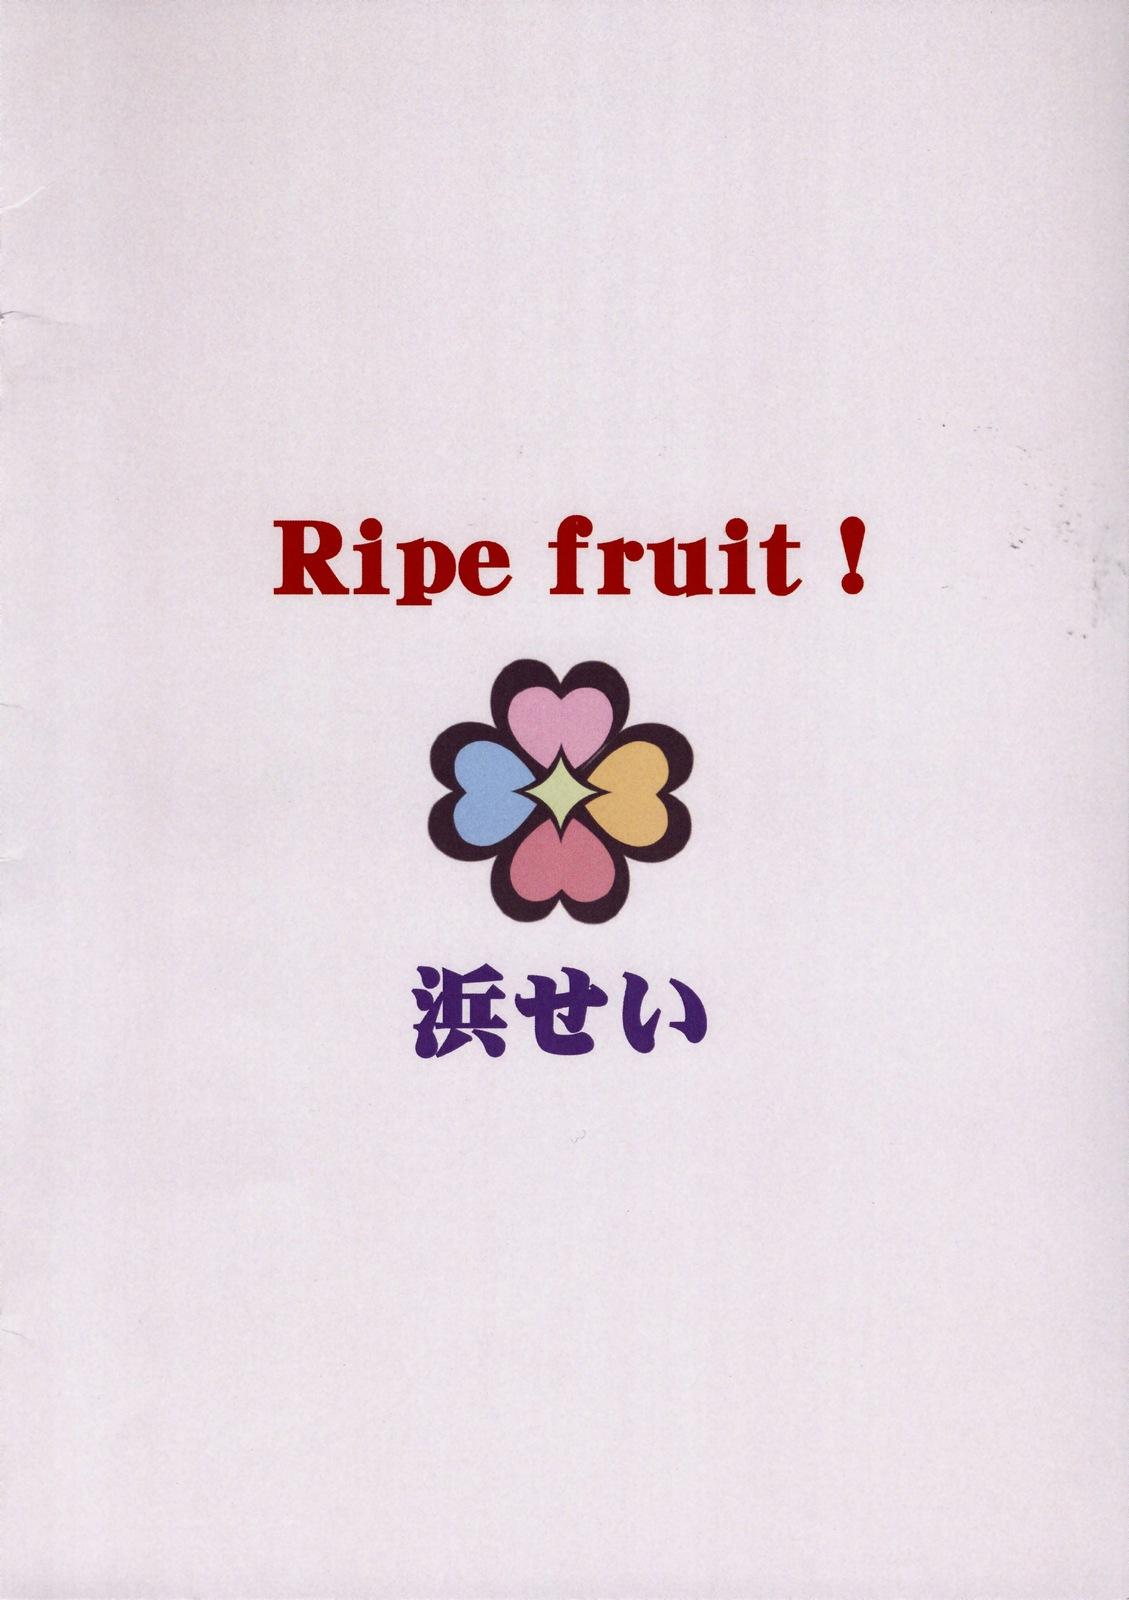 Ripe fruit! 13